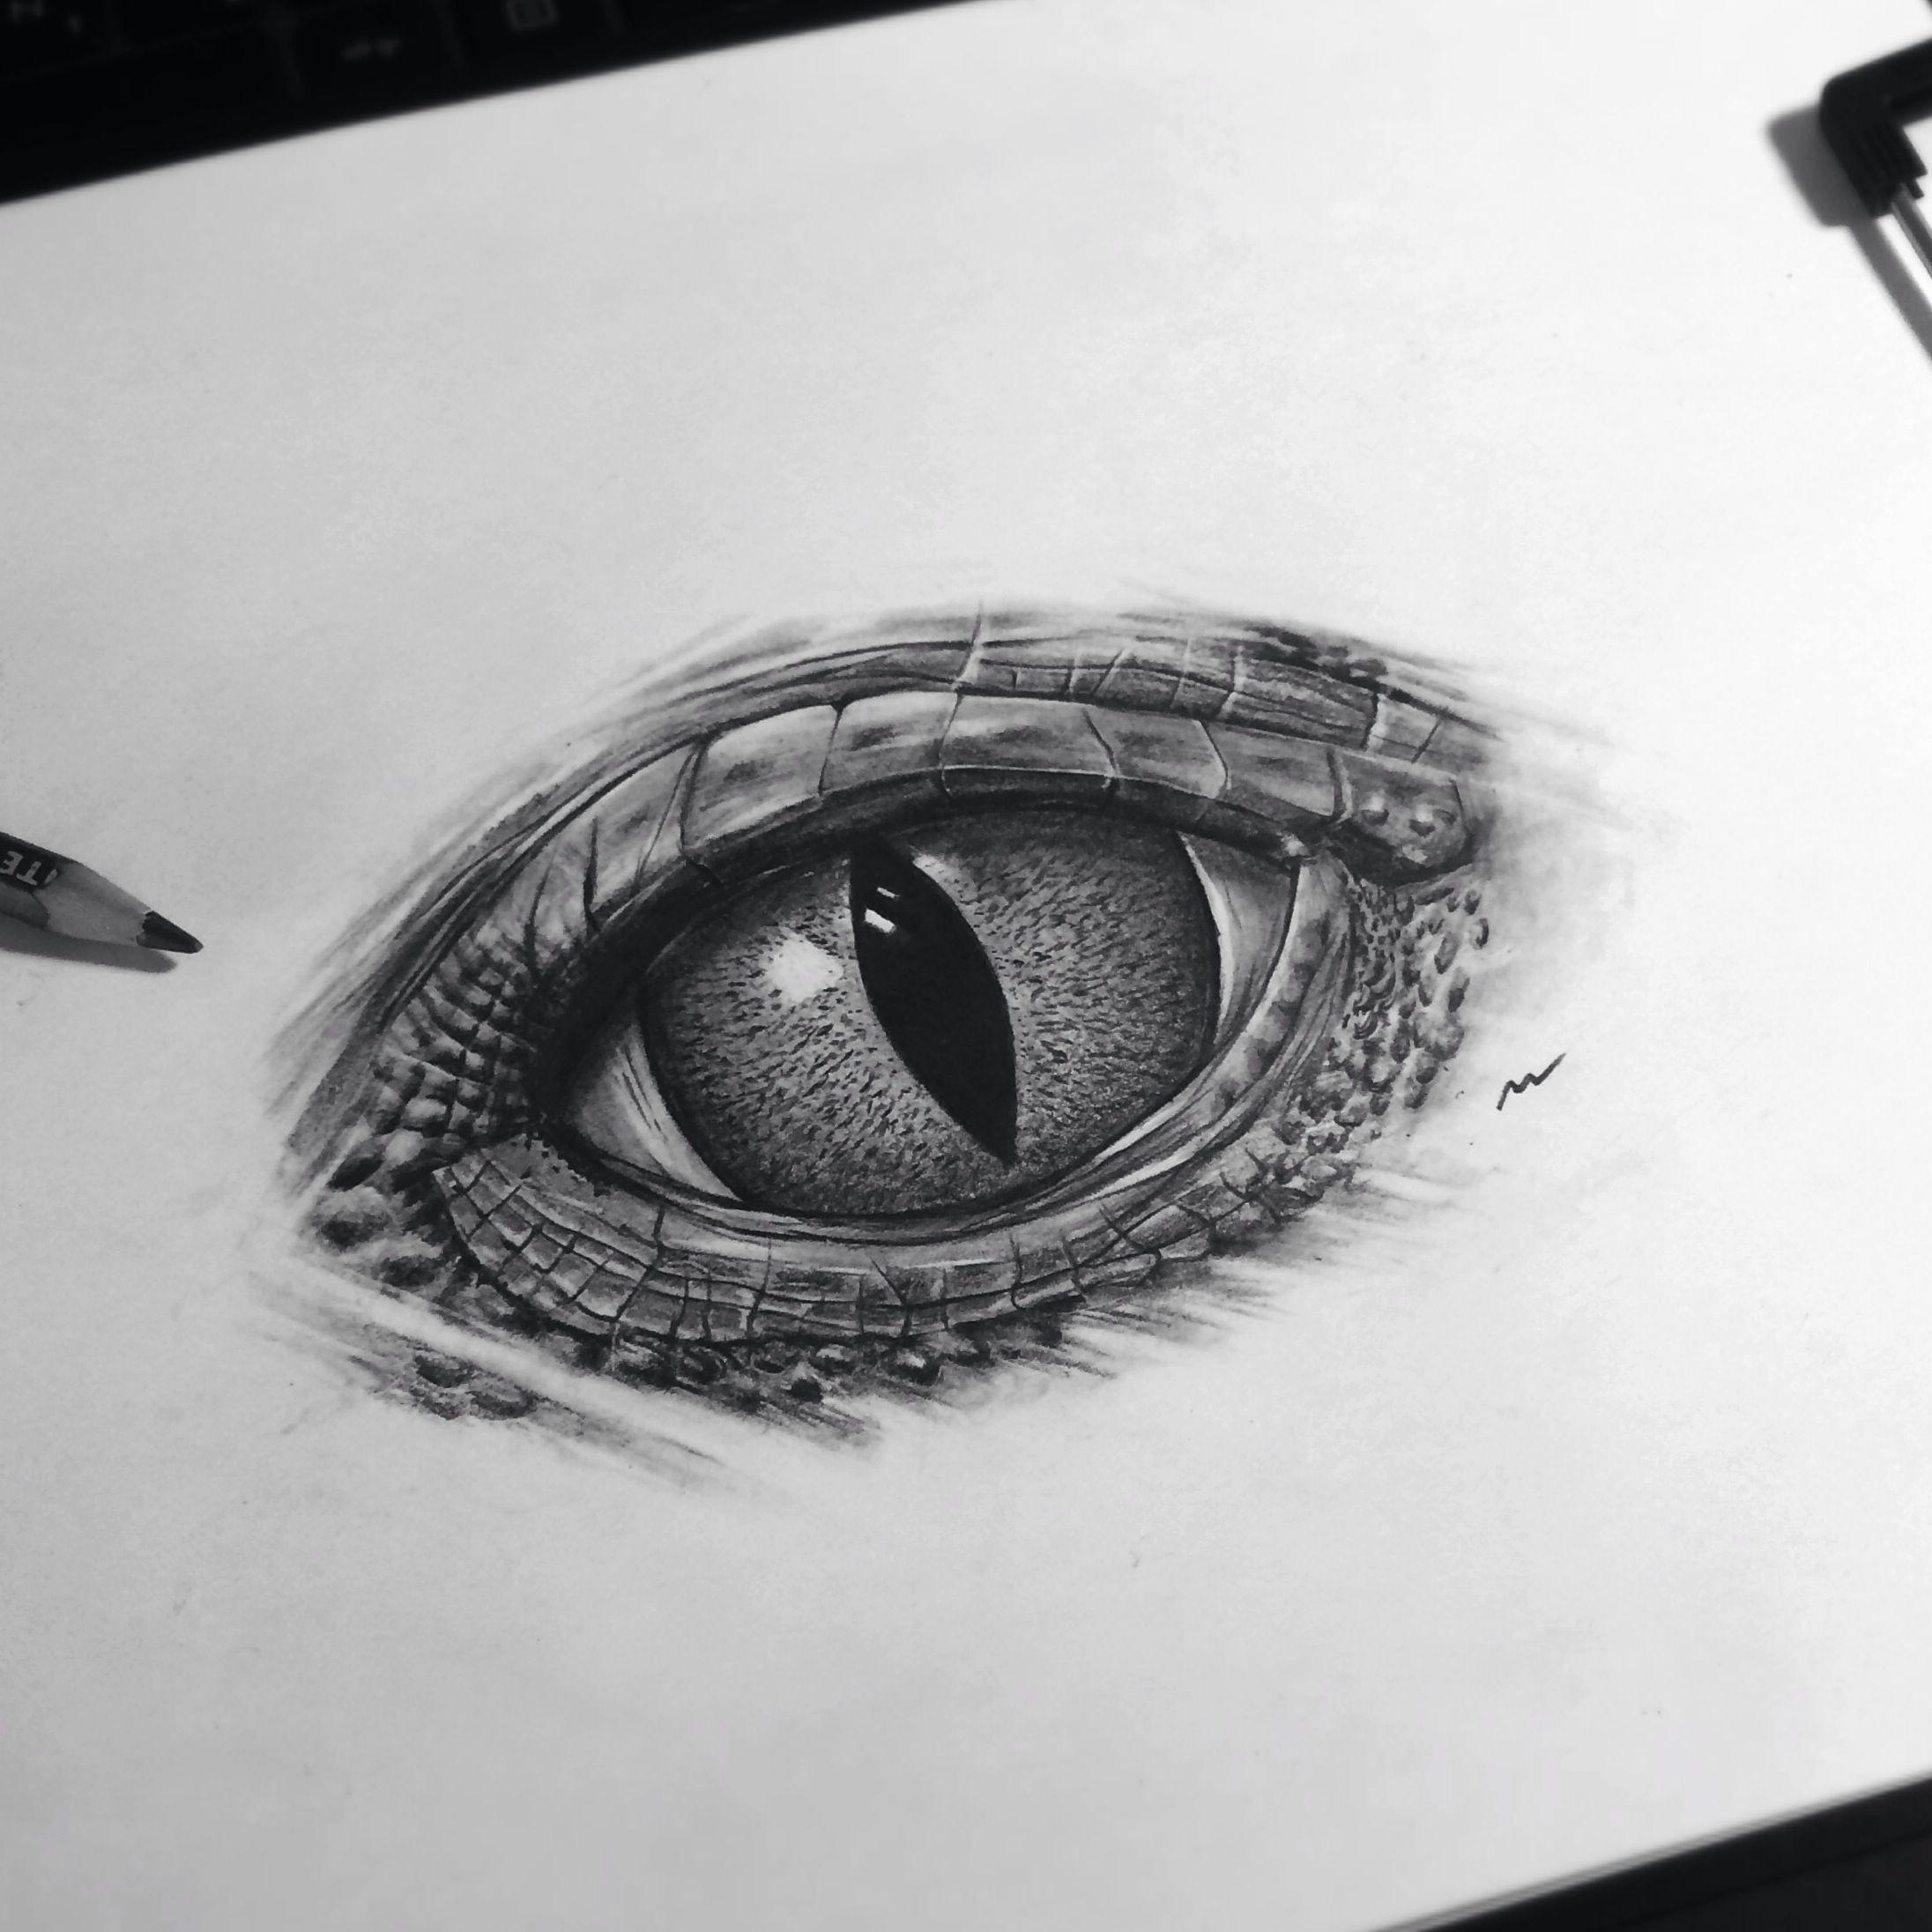 Drawing Lizard Eye New Realistic Eye Reptile Reptileeye Art Artwork Painting